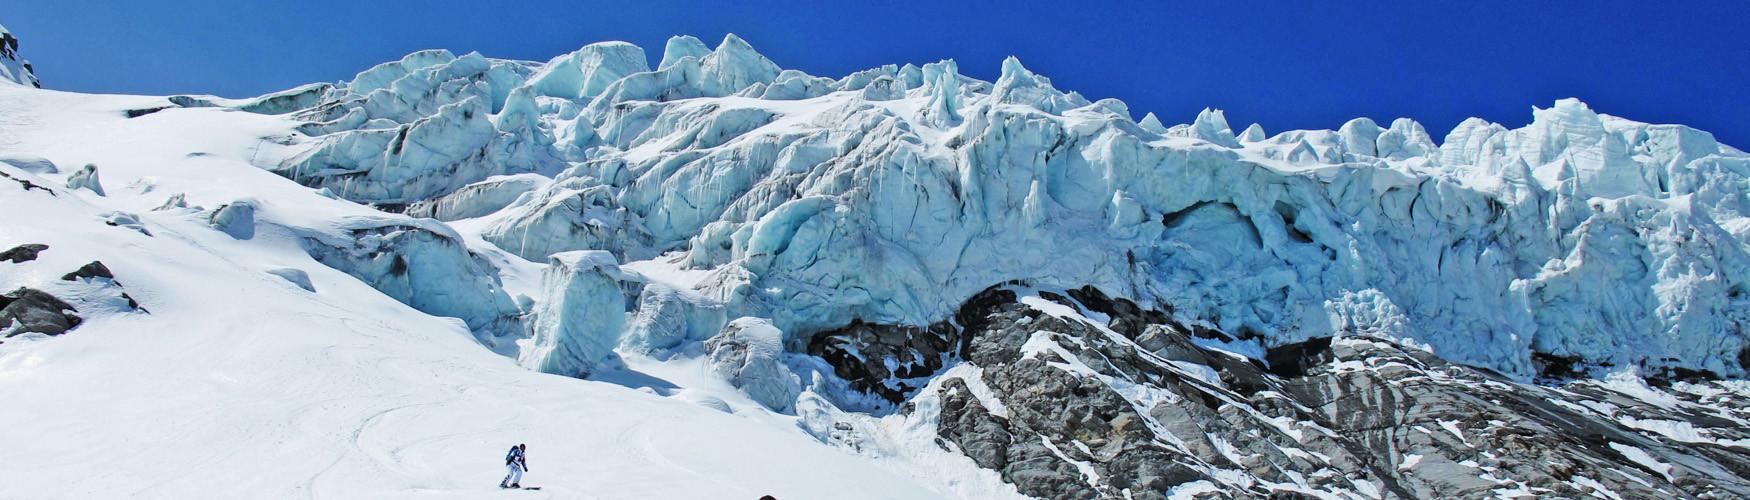 Freeride Zermatt Heliski